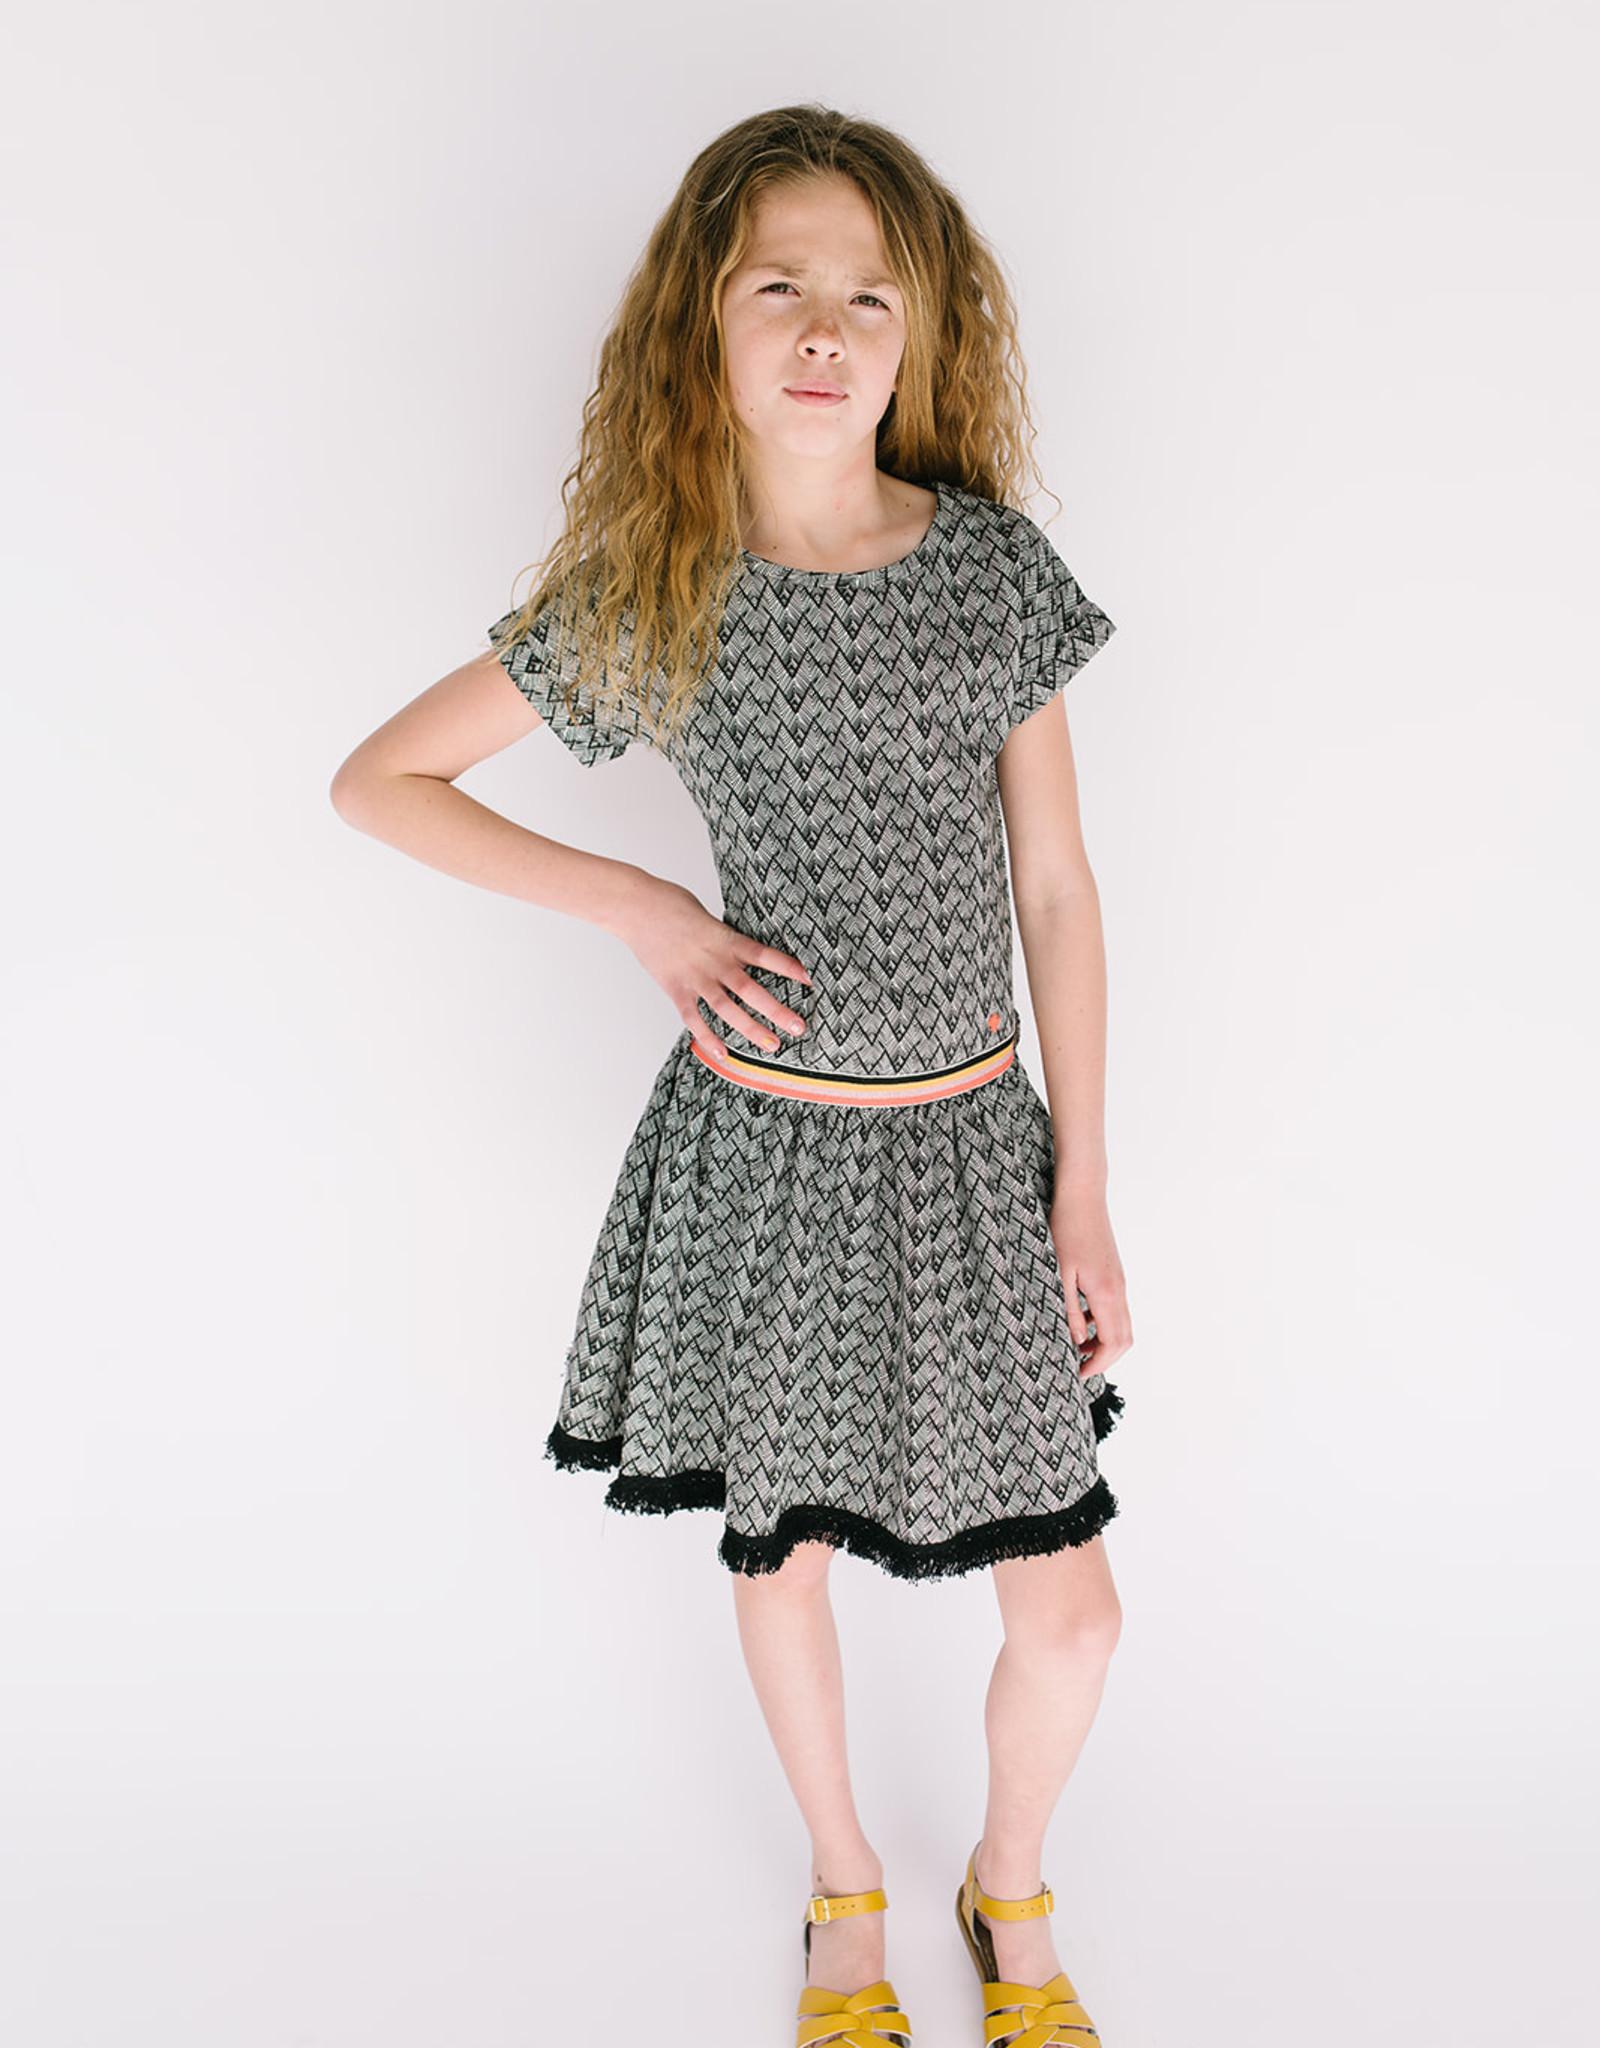 NONO Knit Dress Black White Pattern Multi Waist 5802